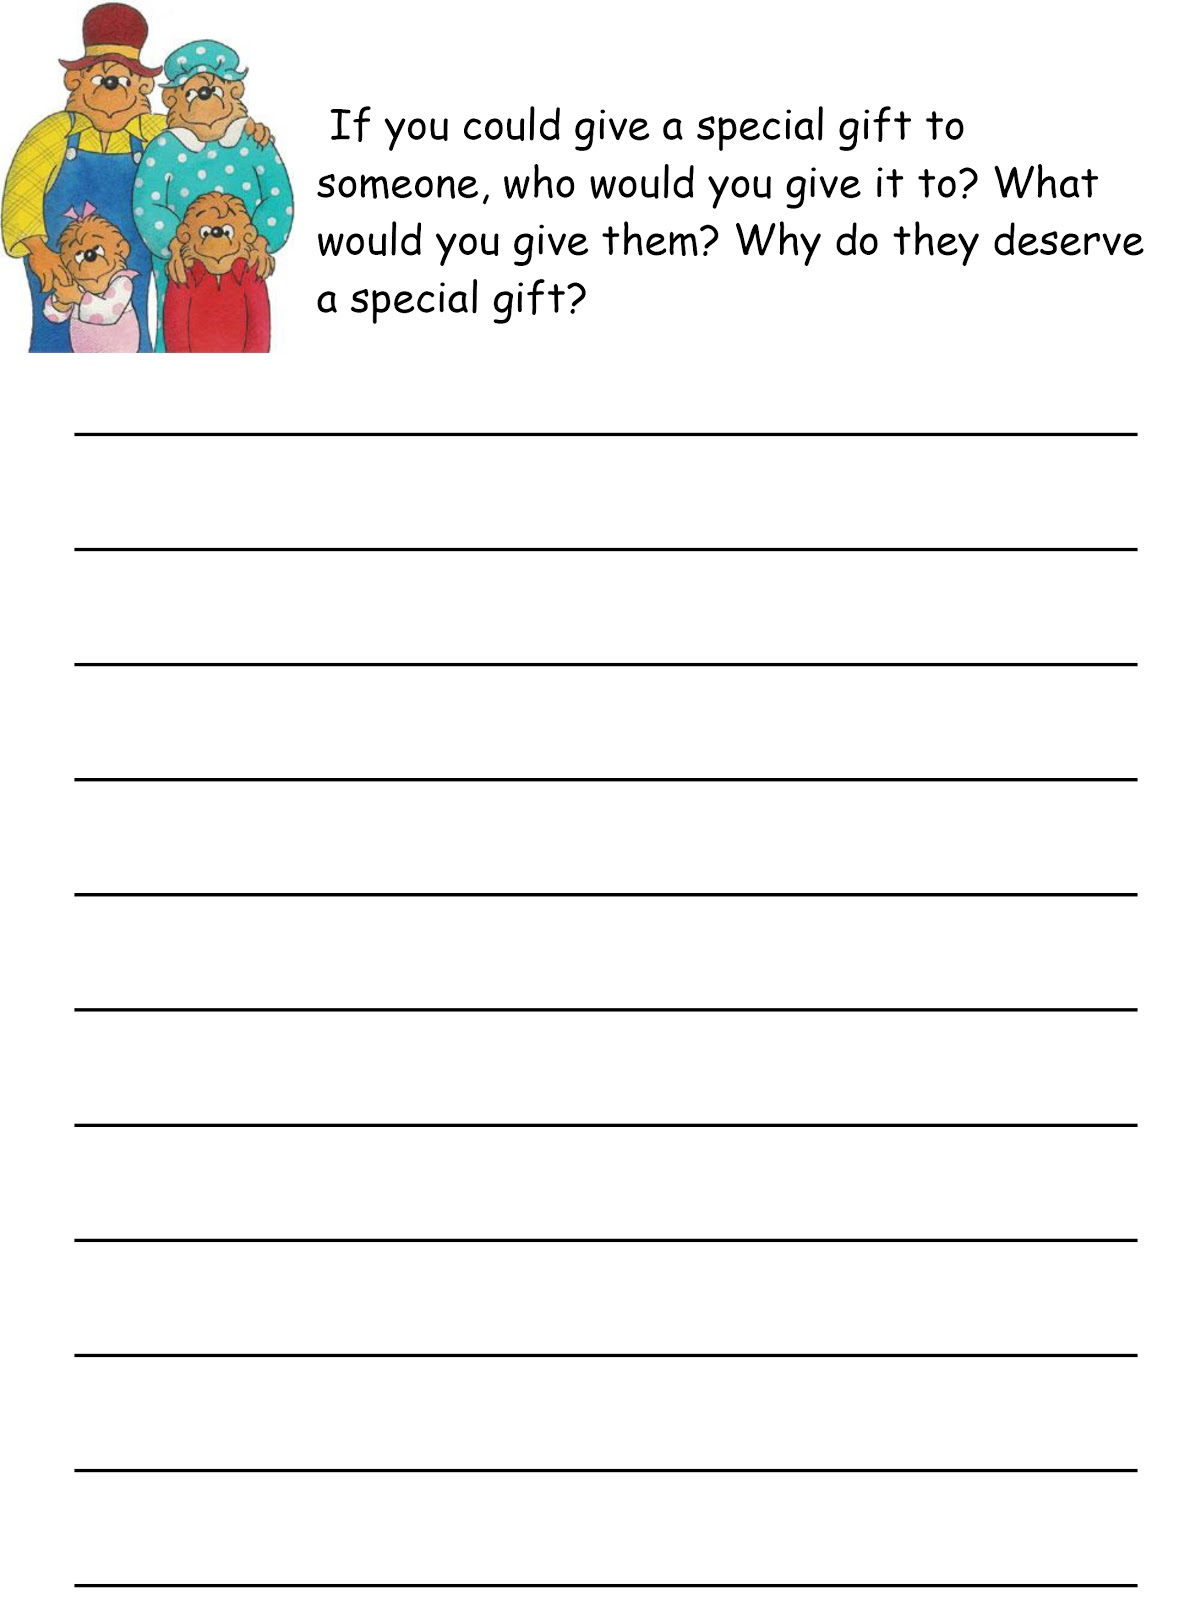 medium resolution of Creative Writing Myself Grade 1 - — Help on writing an essay about myself